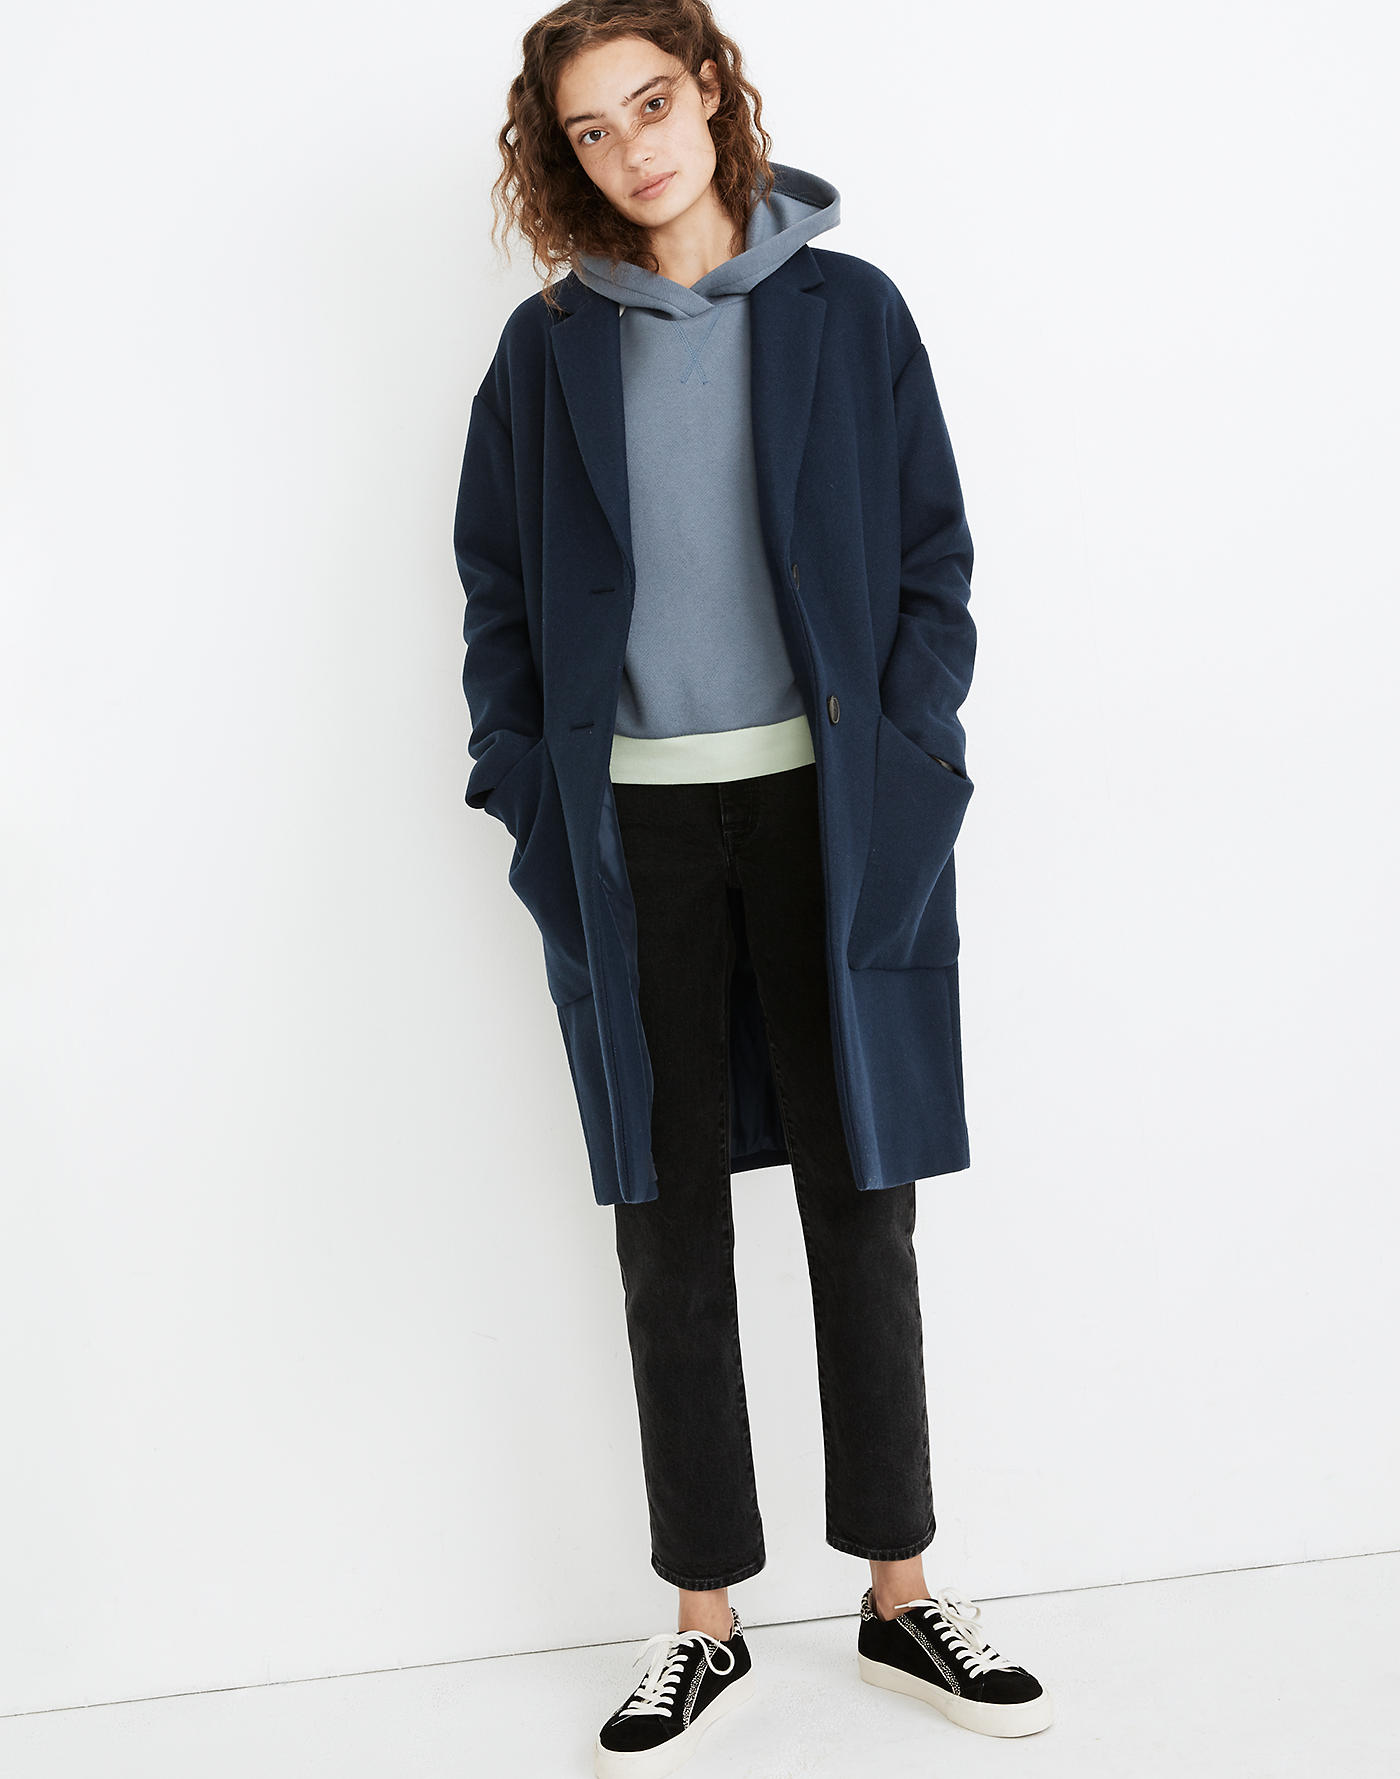 Elmcourt Coat in Insuluxe Fabric